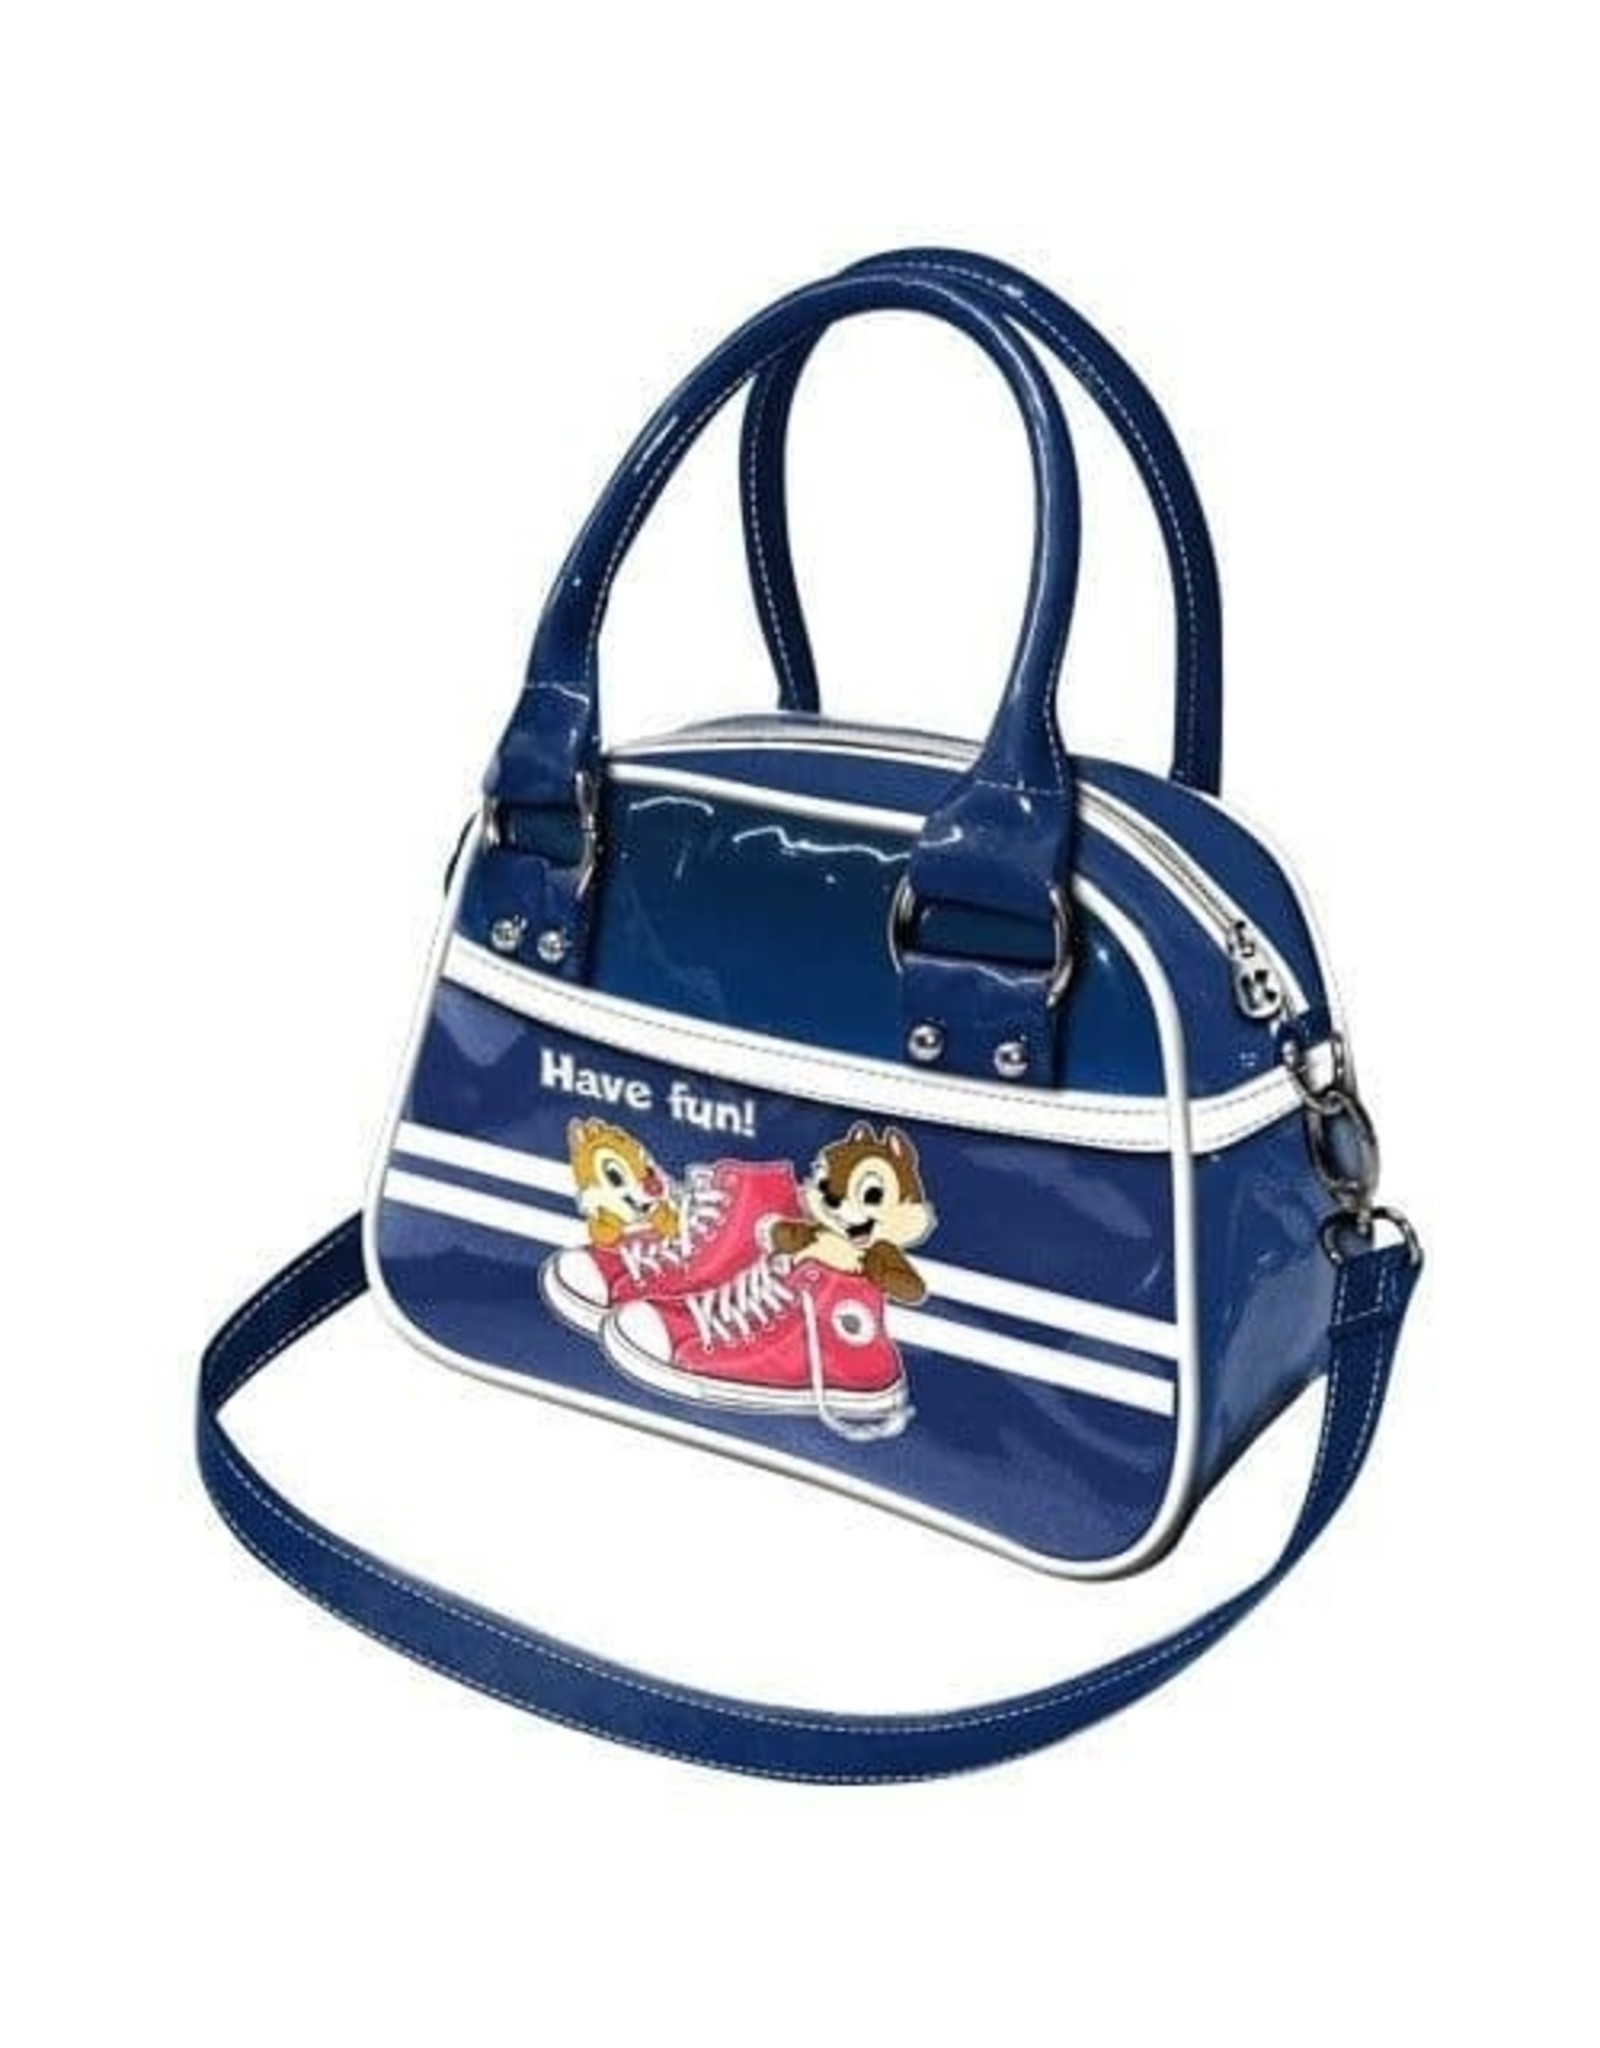 Disney Disney tassen - Disney tas Chip n Dale Have fun 7392